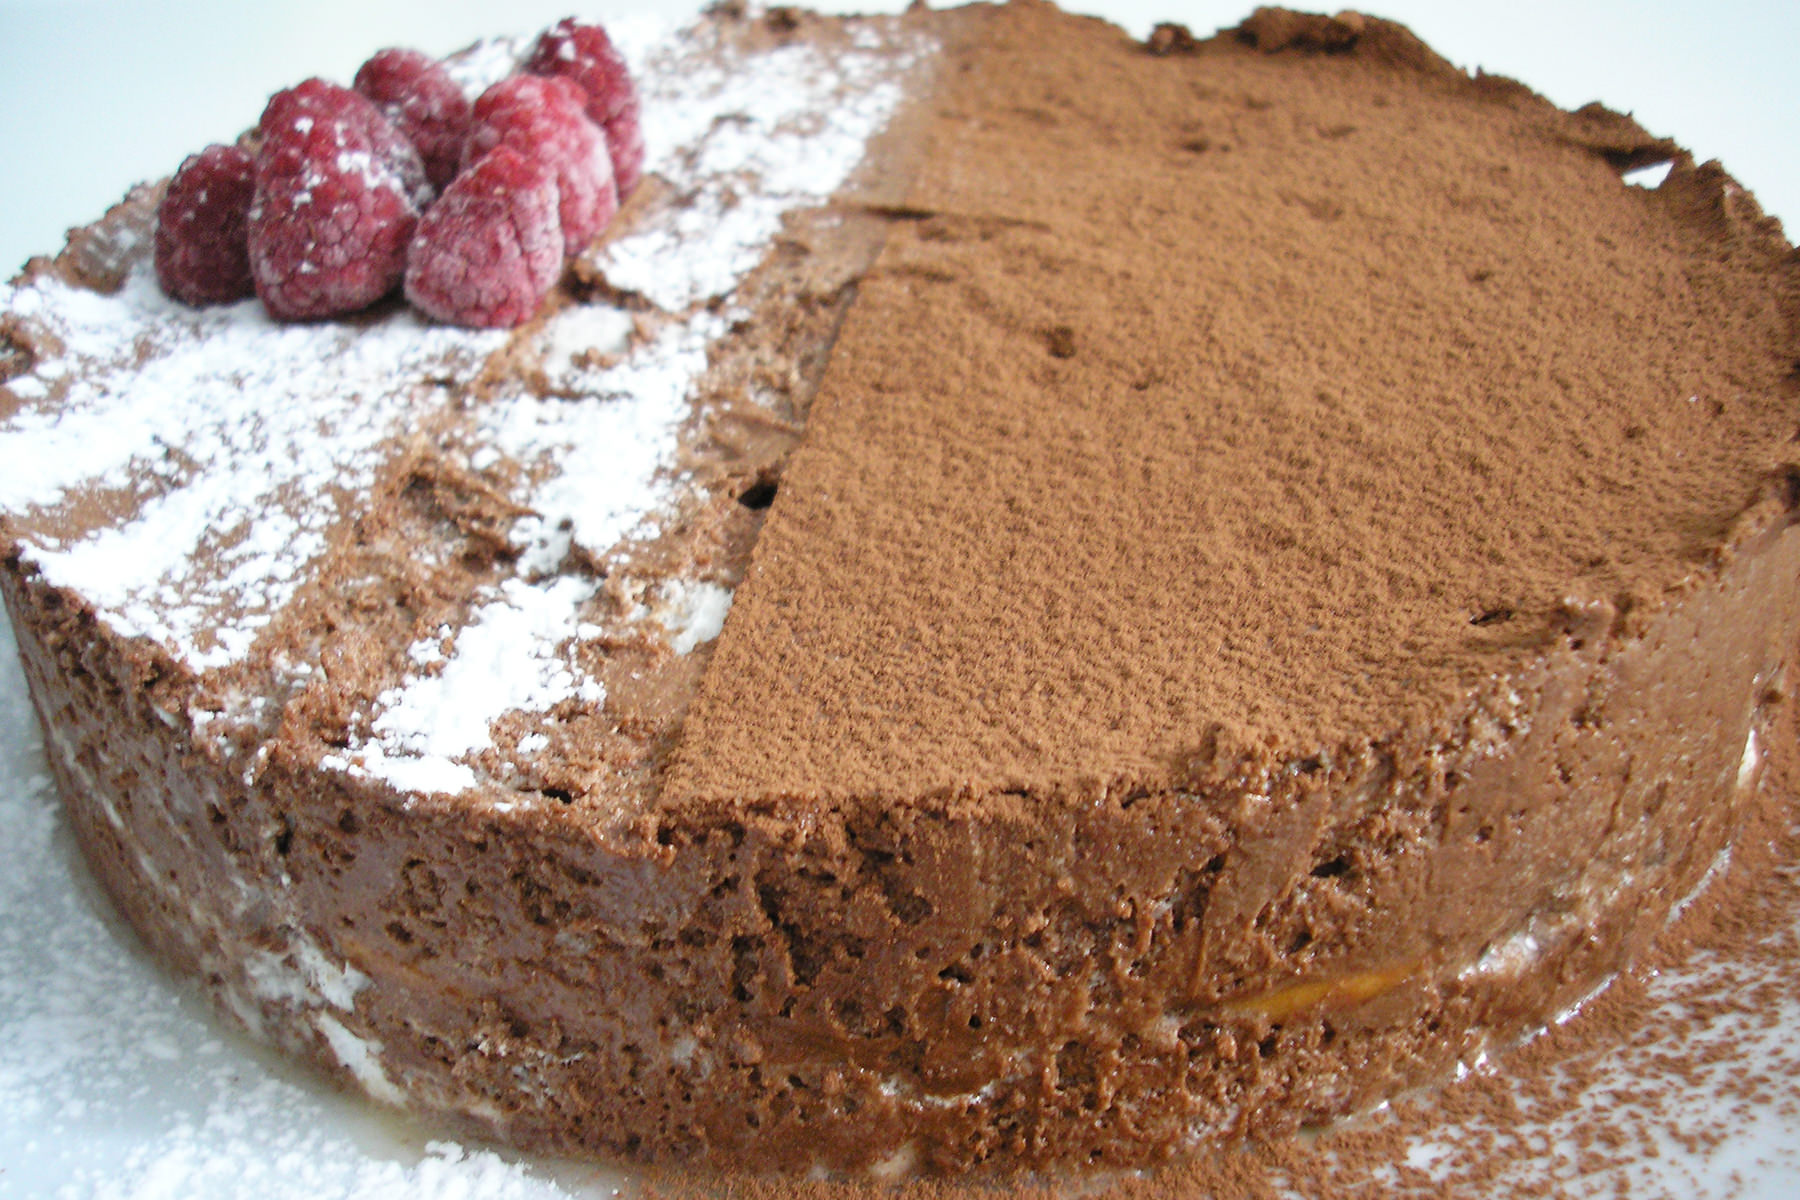 Curso de técnicas express de la Escuela de cocina TELVA - Programa - Mousse de chocolate